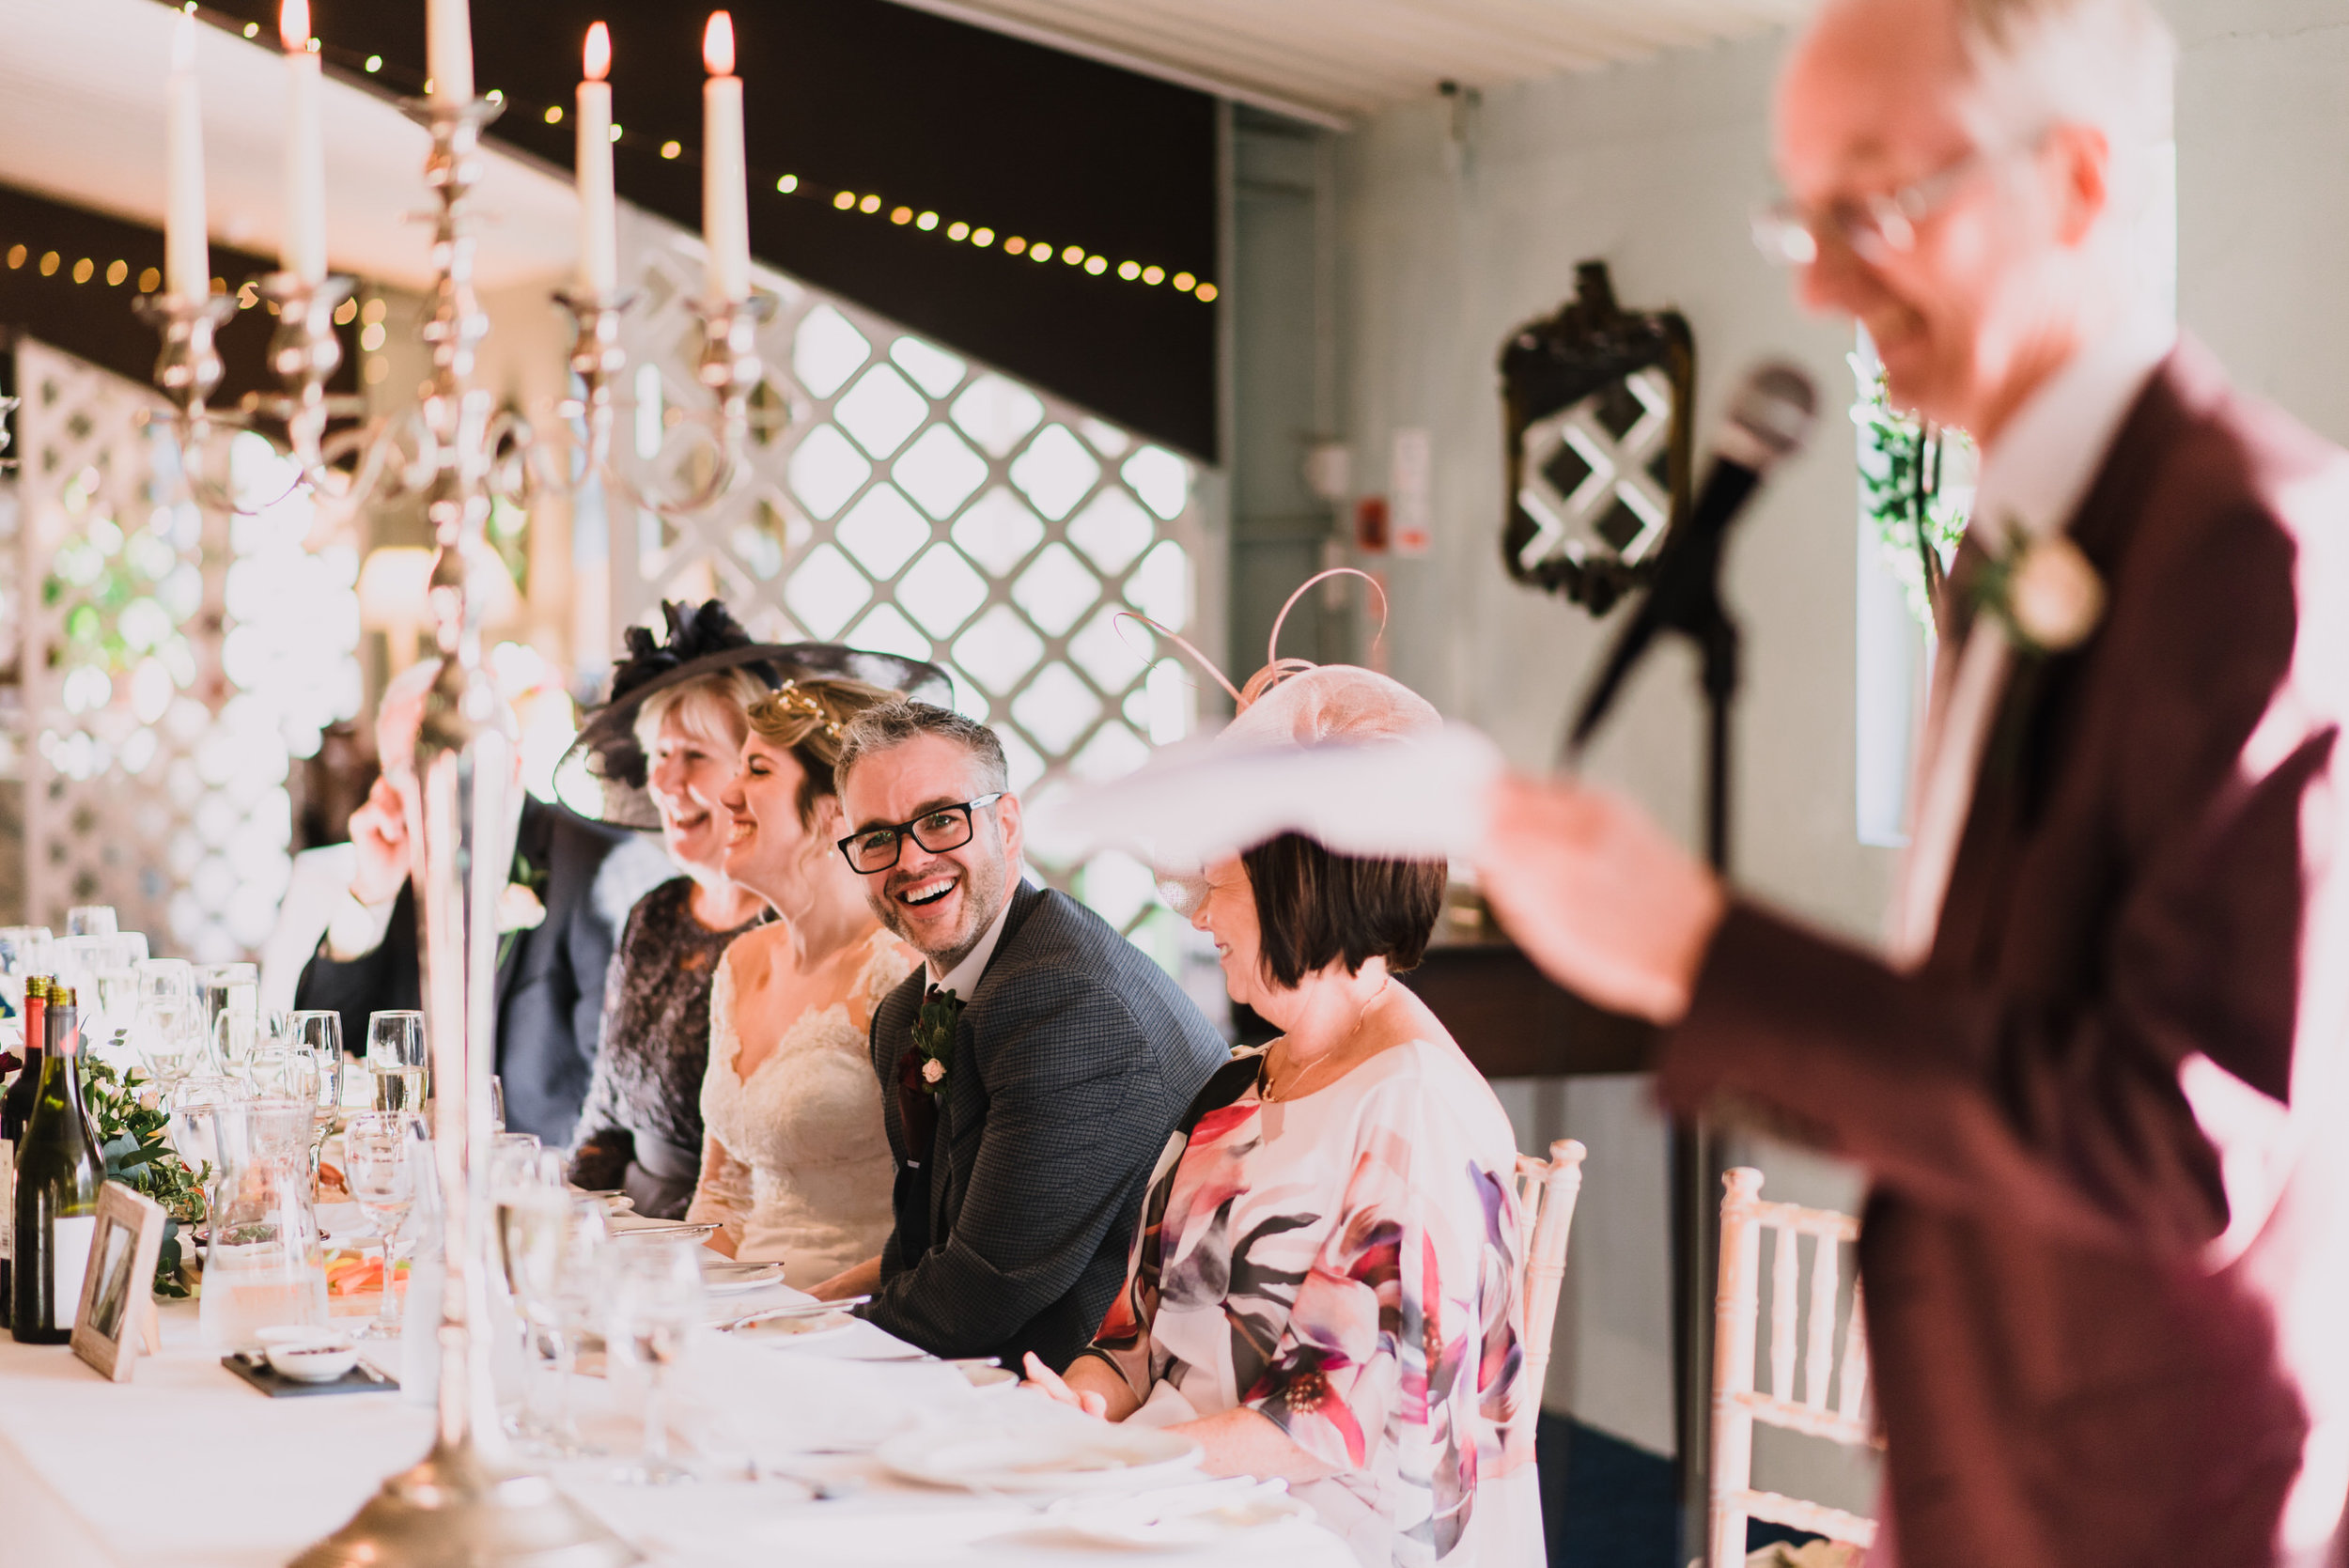 lissanoure castle wedding, northern ireland wedding photographer, romantic northern irish wedding venue, castle wedding ireland, natural wedding photography ni (112).jpg